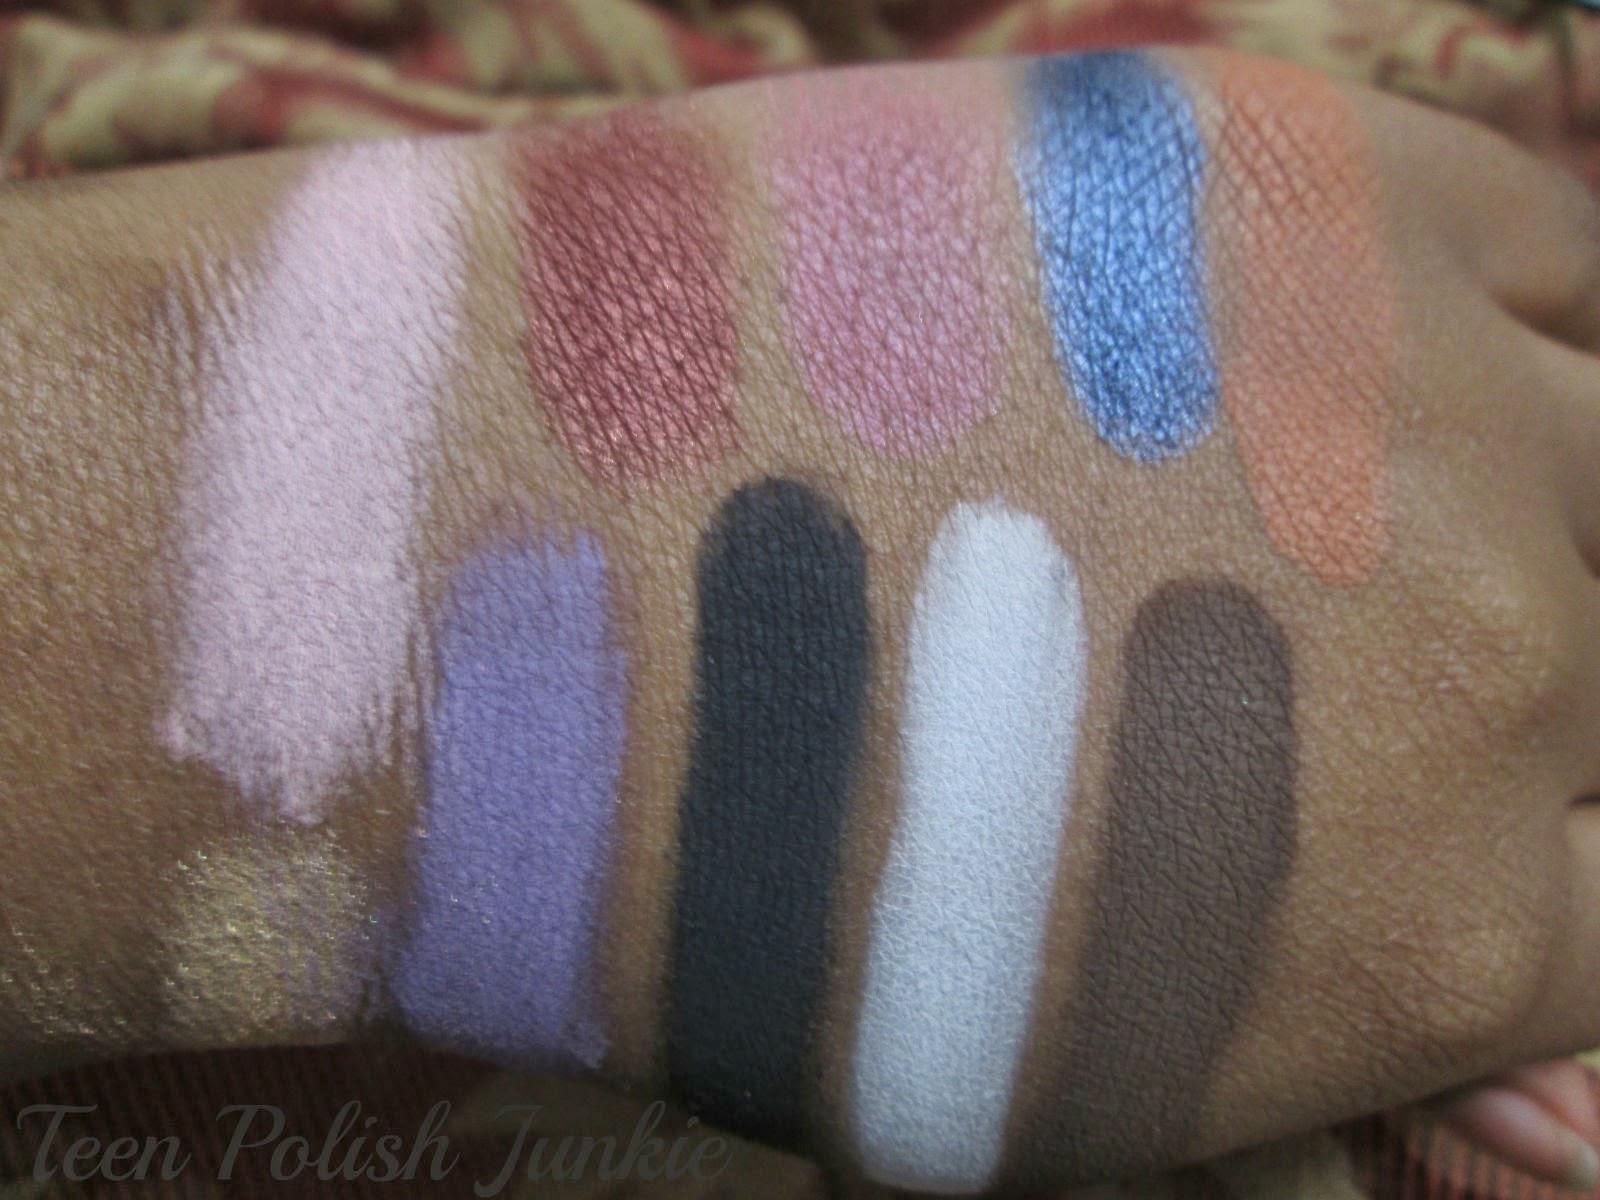 Teen Polish Junkie: Jordane Cosmetics - S&R Series Eyeshadow Palette